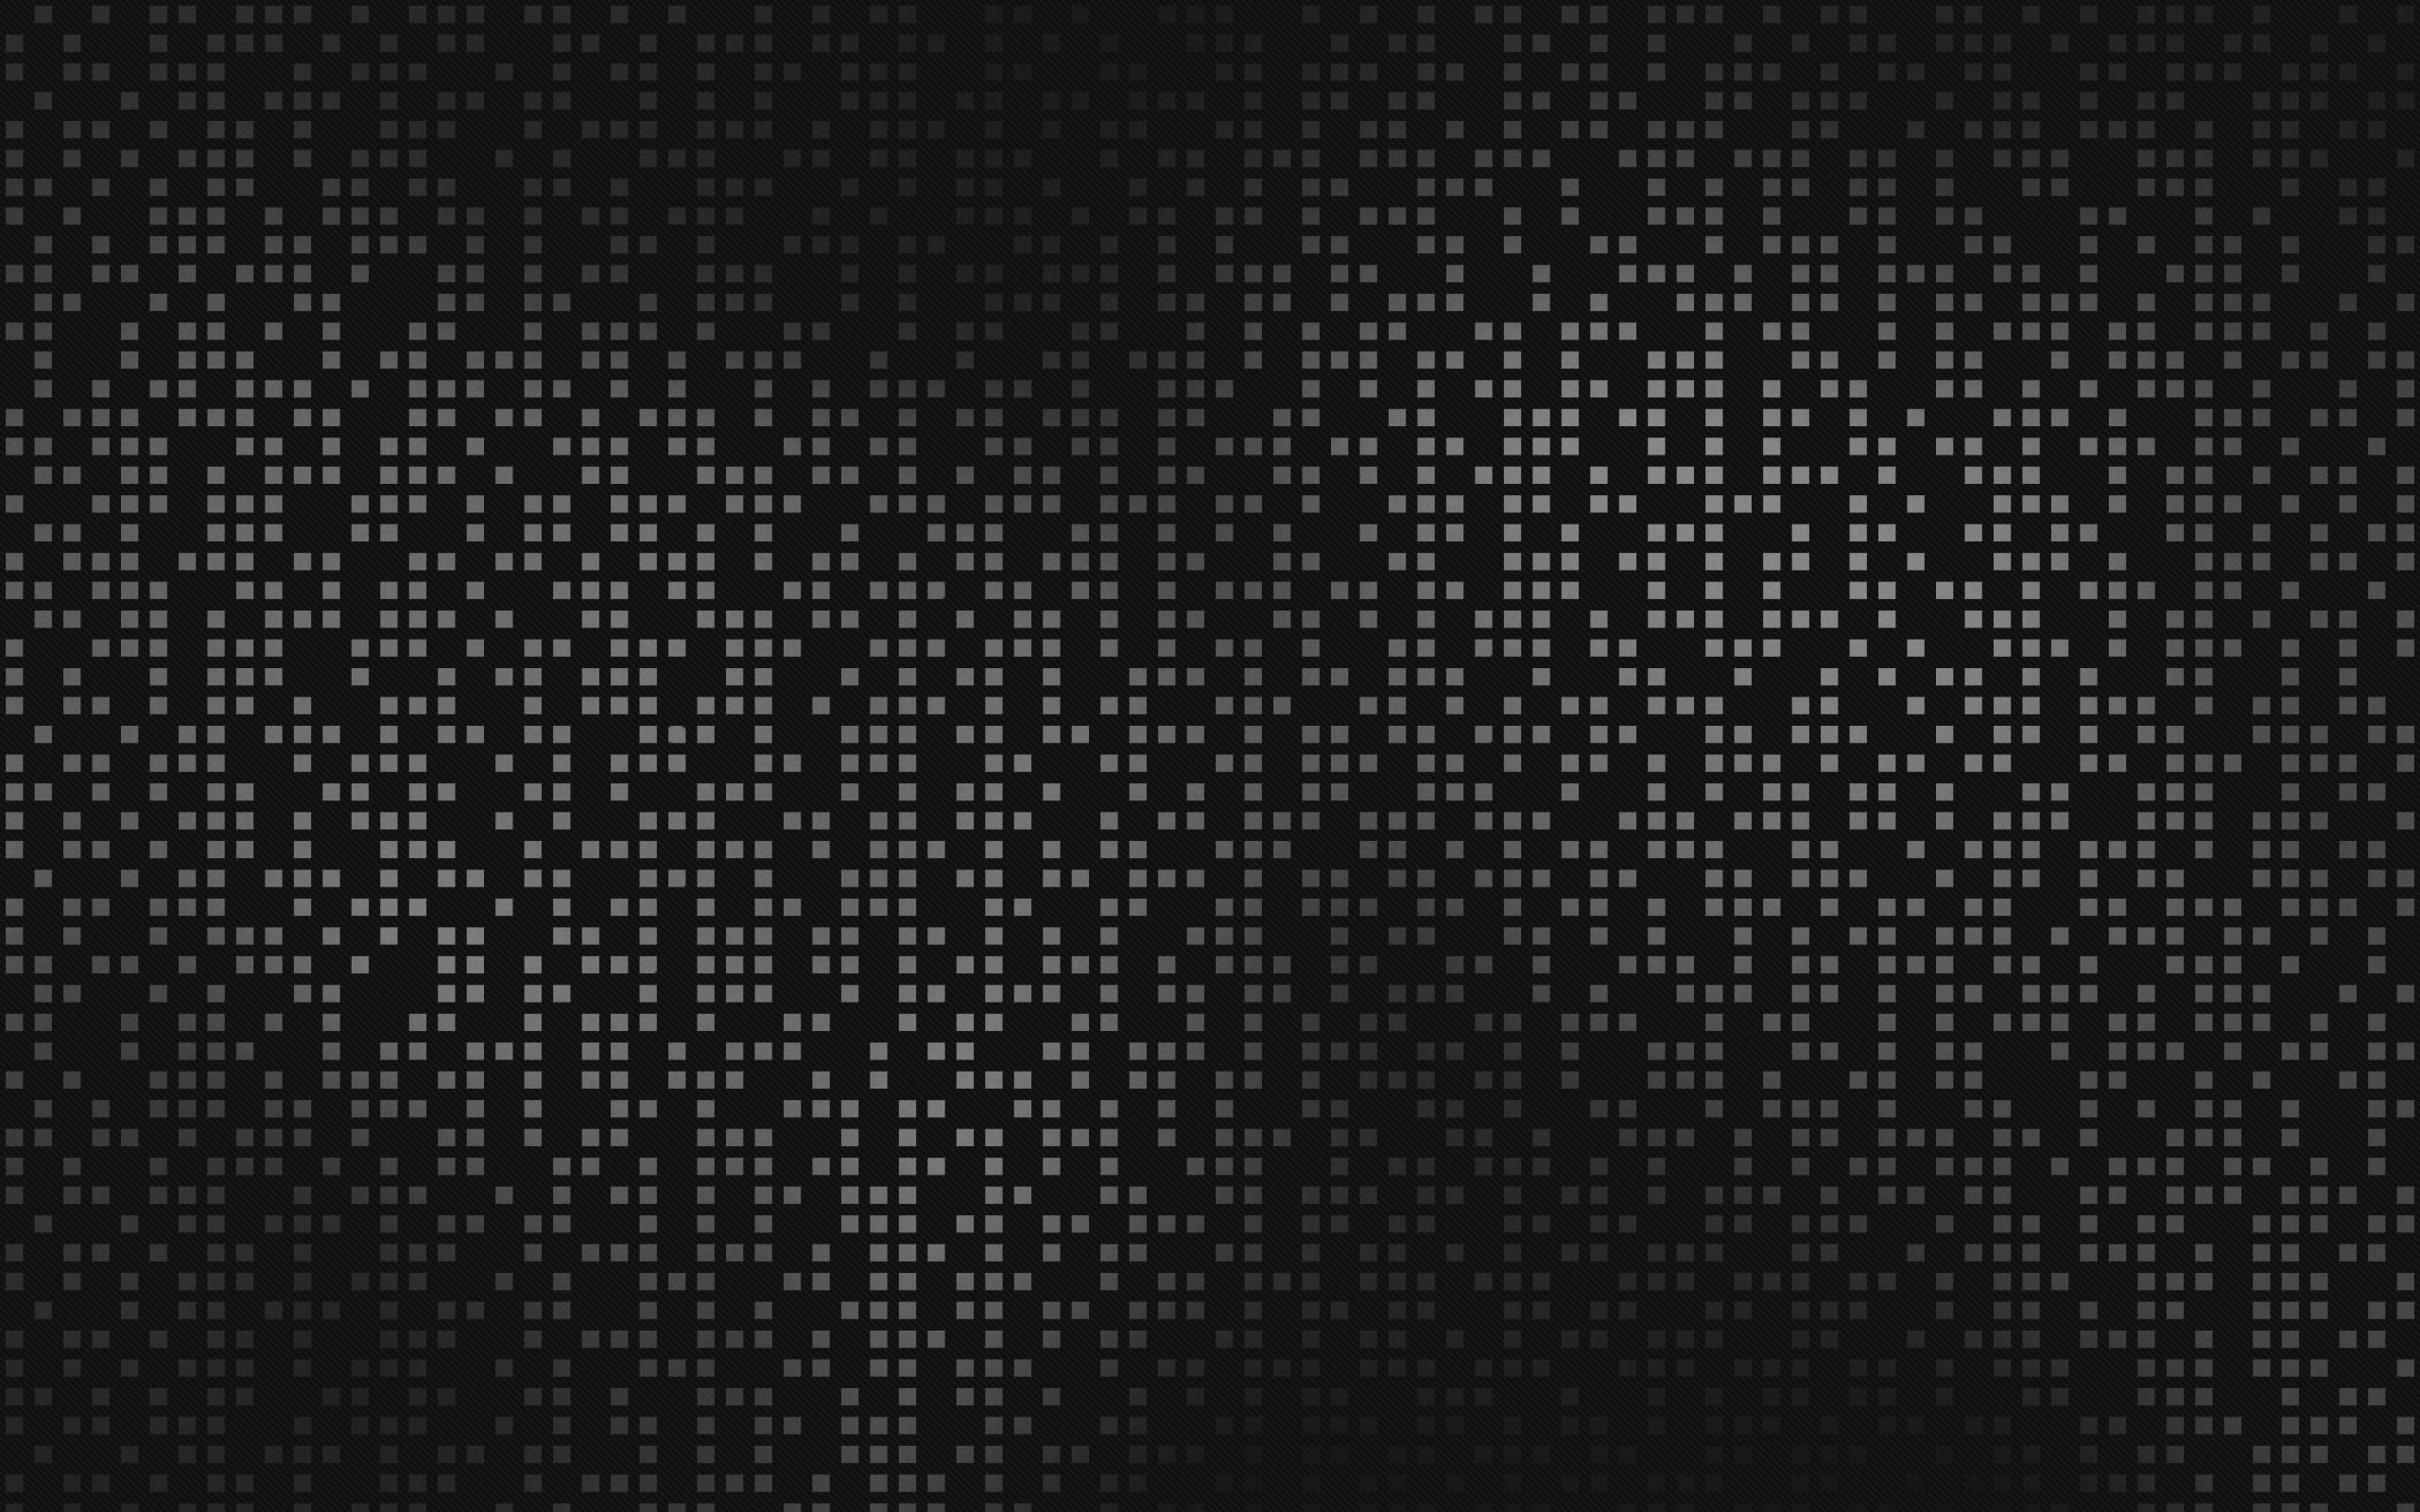 gray-wallpaper-22109-22665-hd-wallpapers